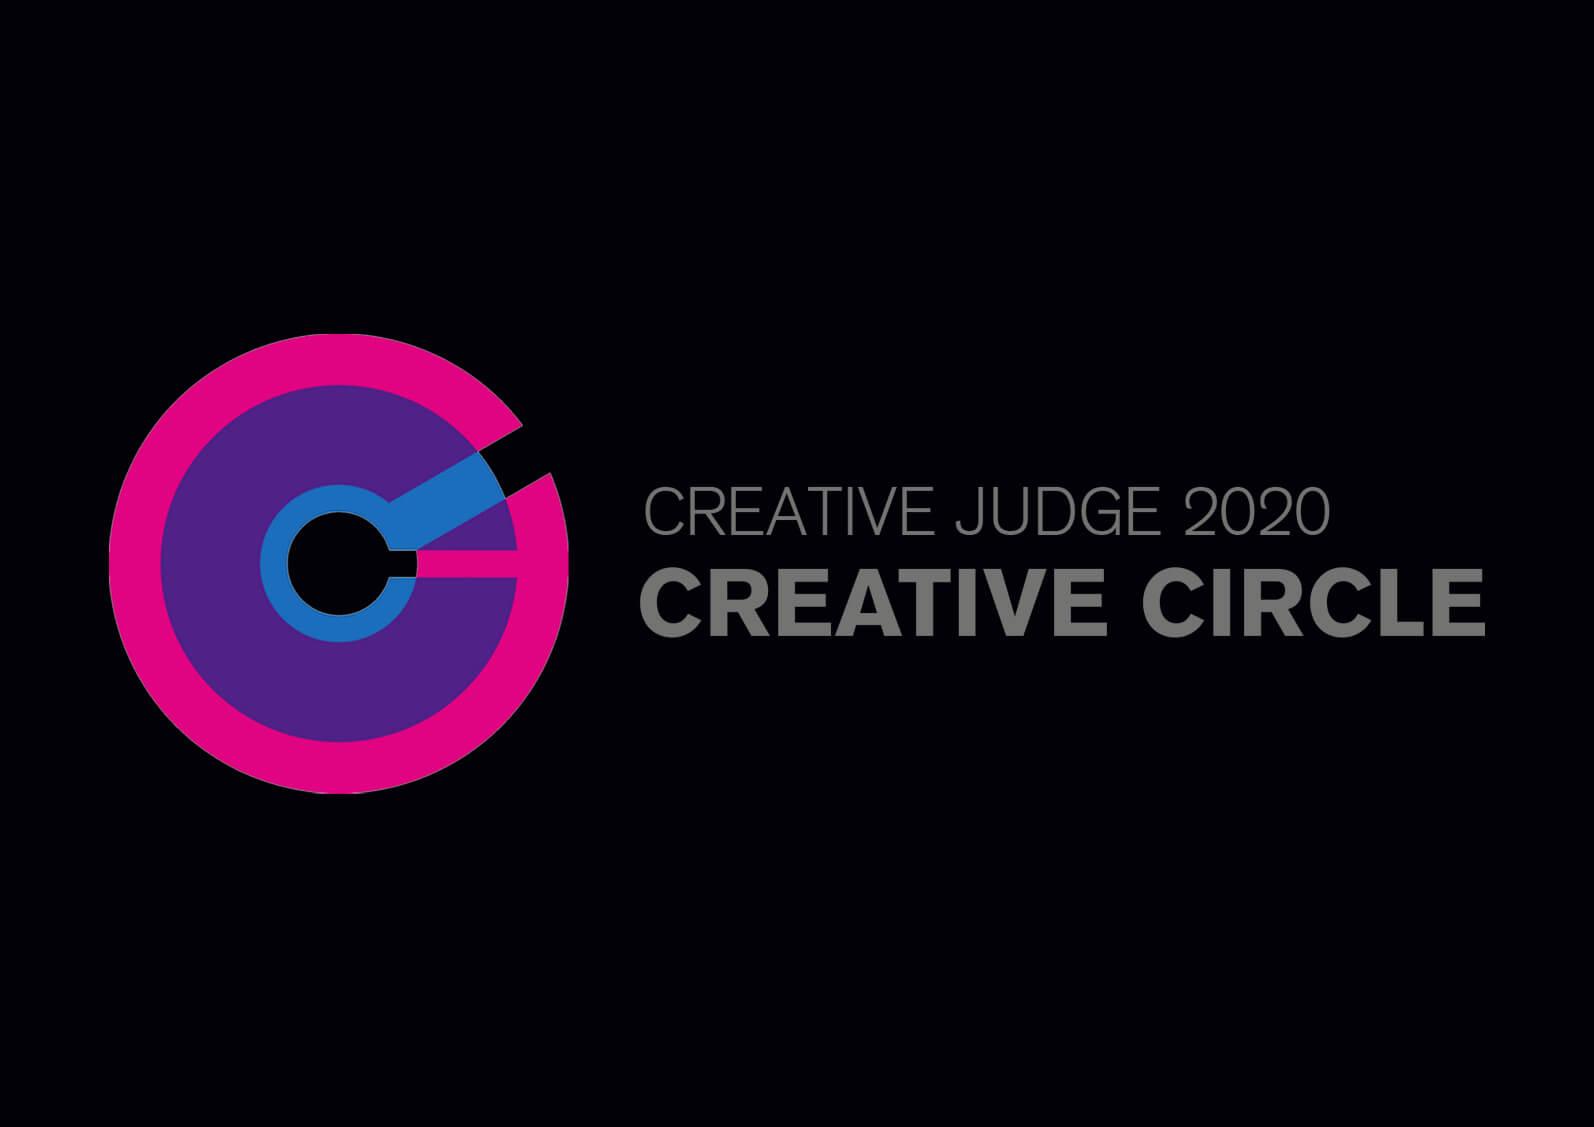 creativecircle2020